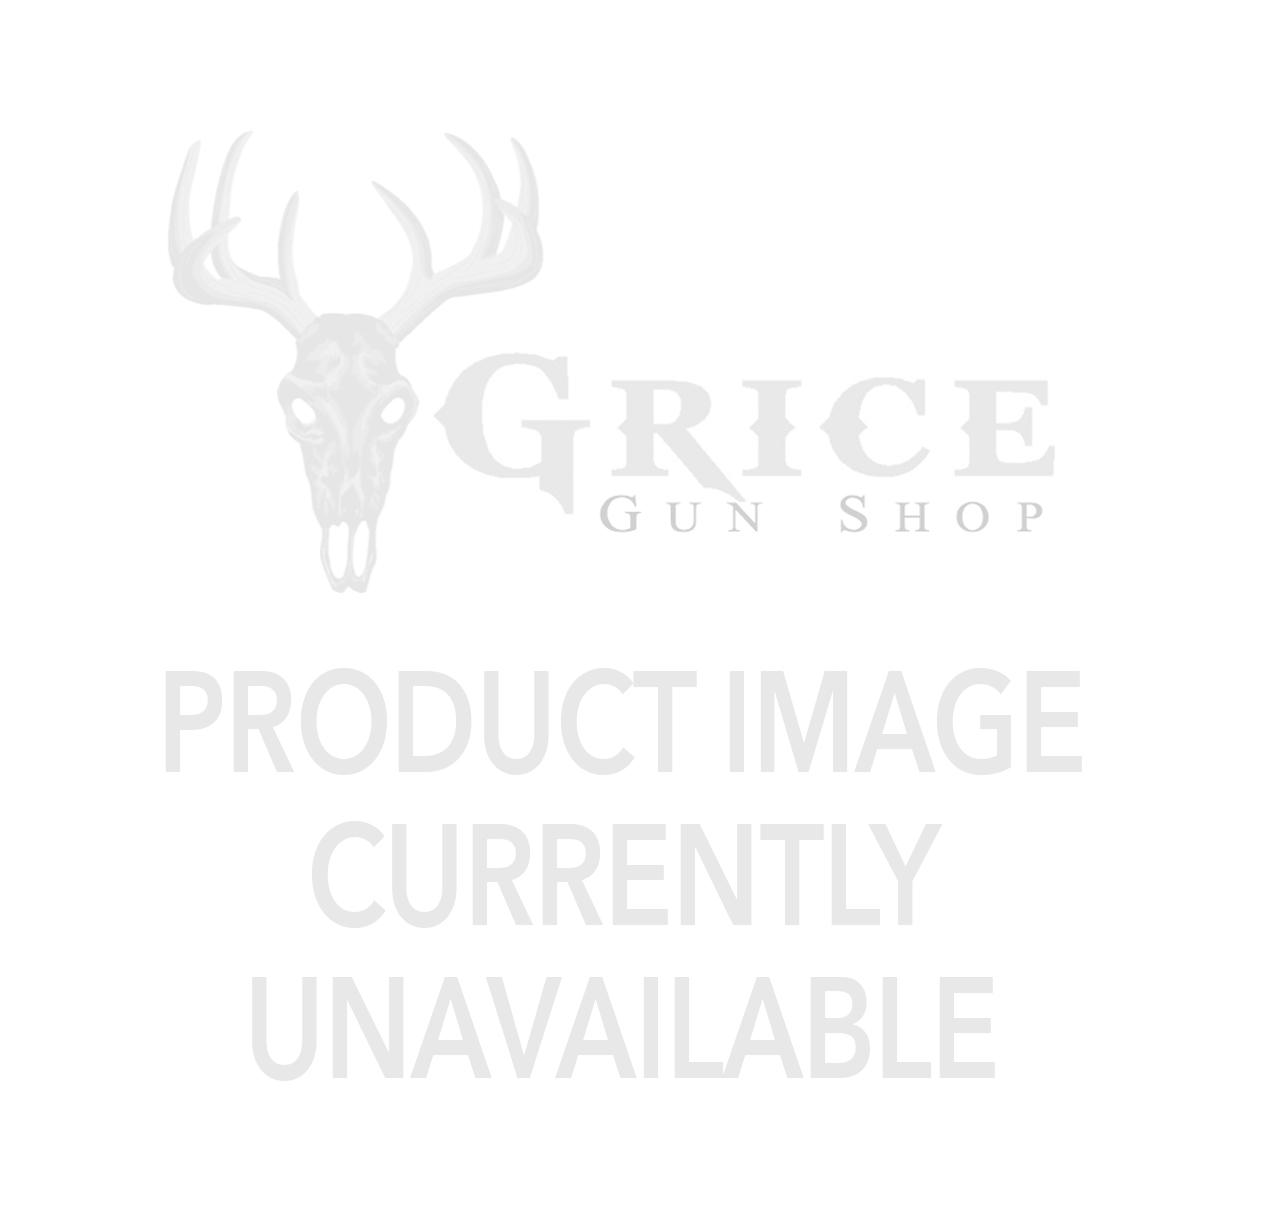 GSM - 12MP G34 Pro Rub Texture